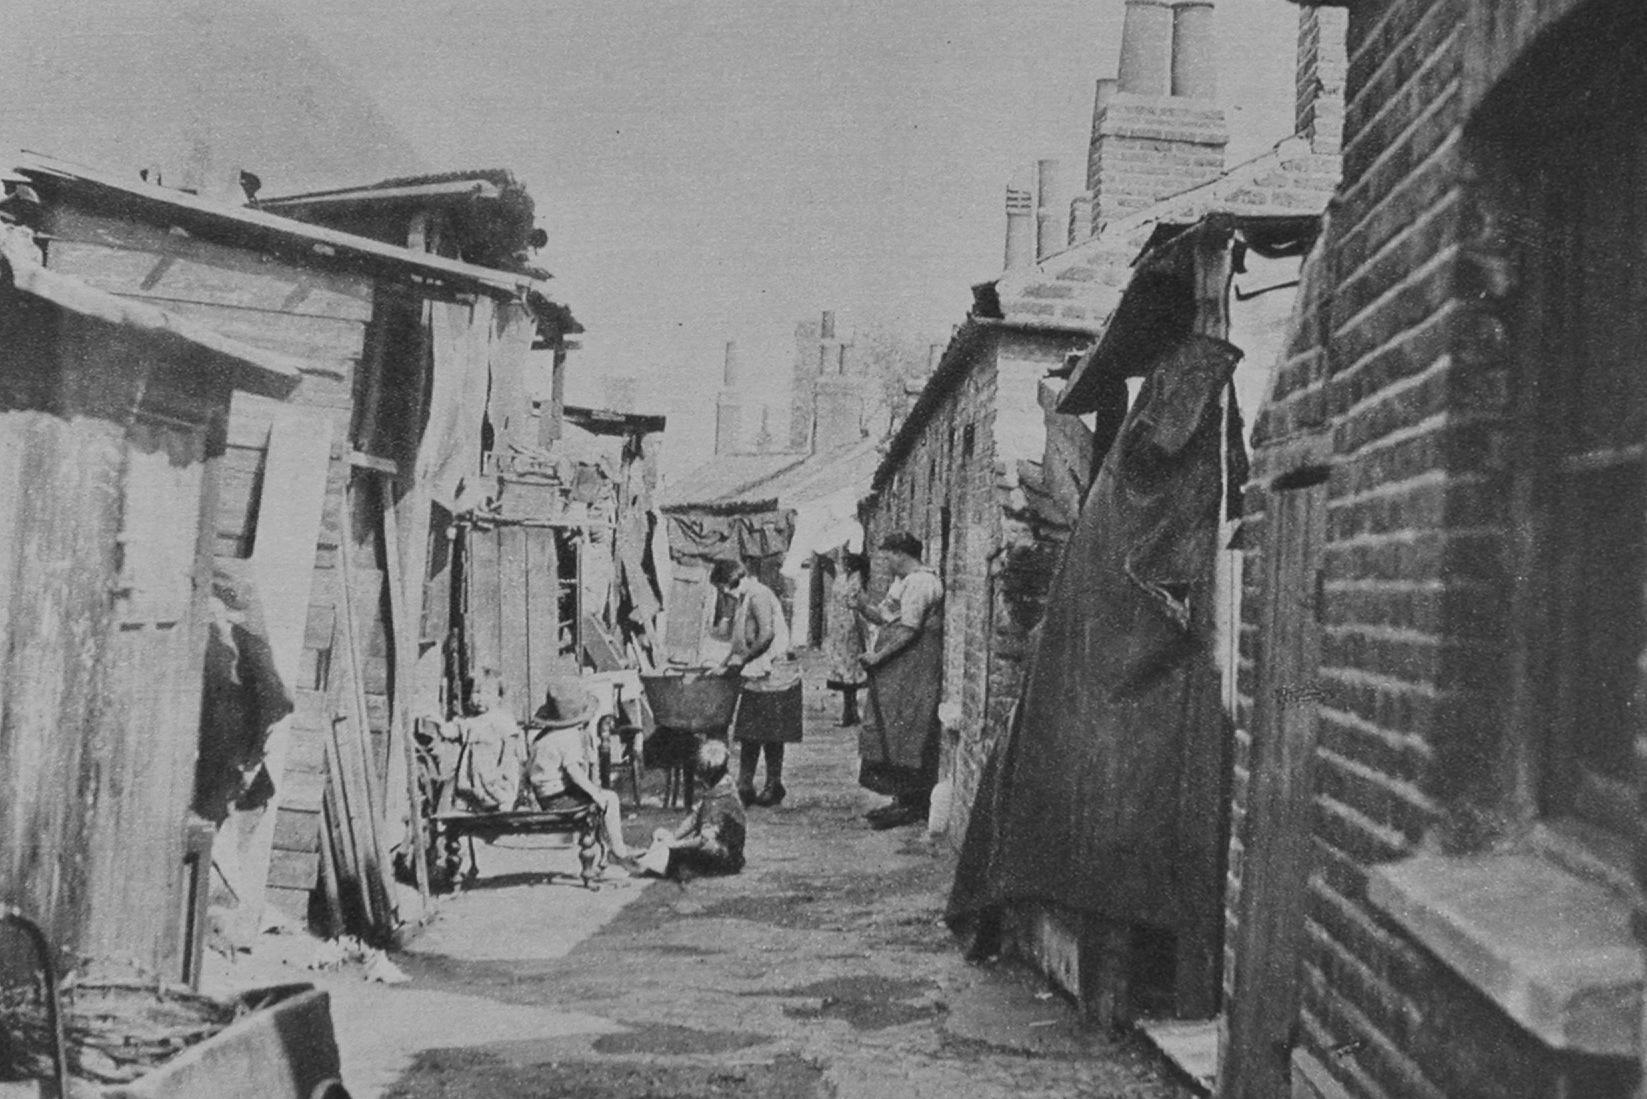 Slum Dwellings In The 1930s